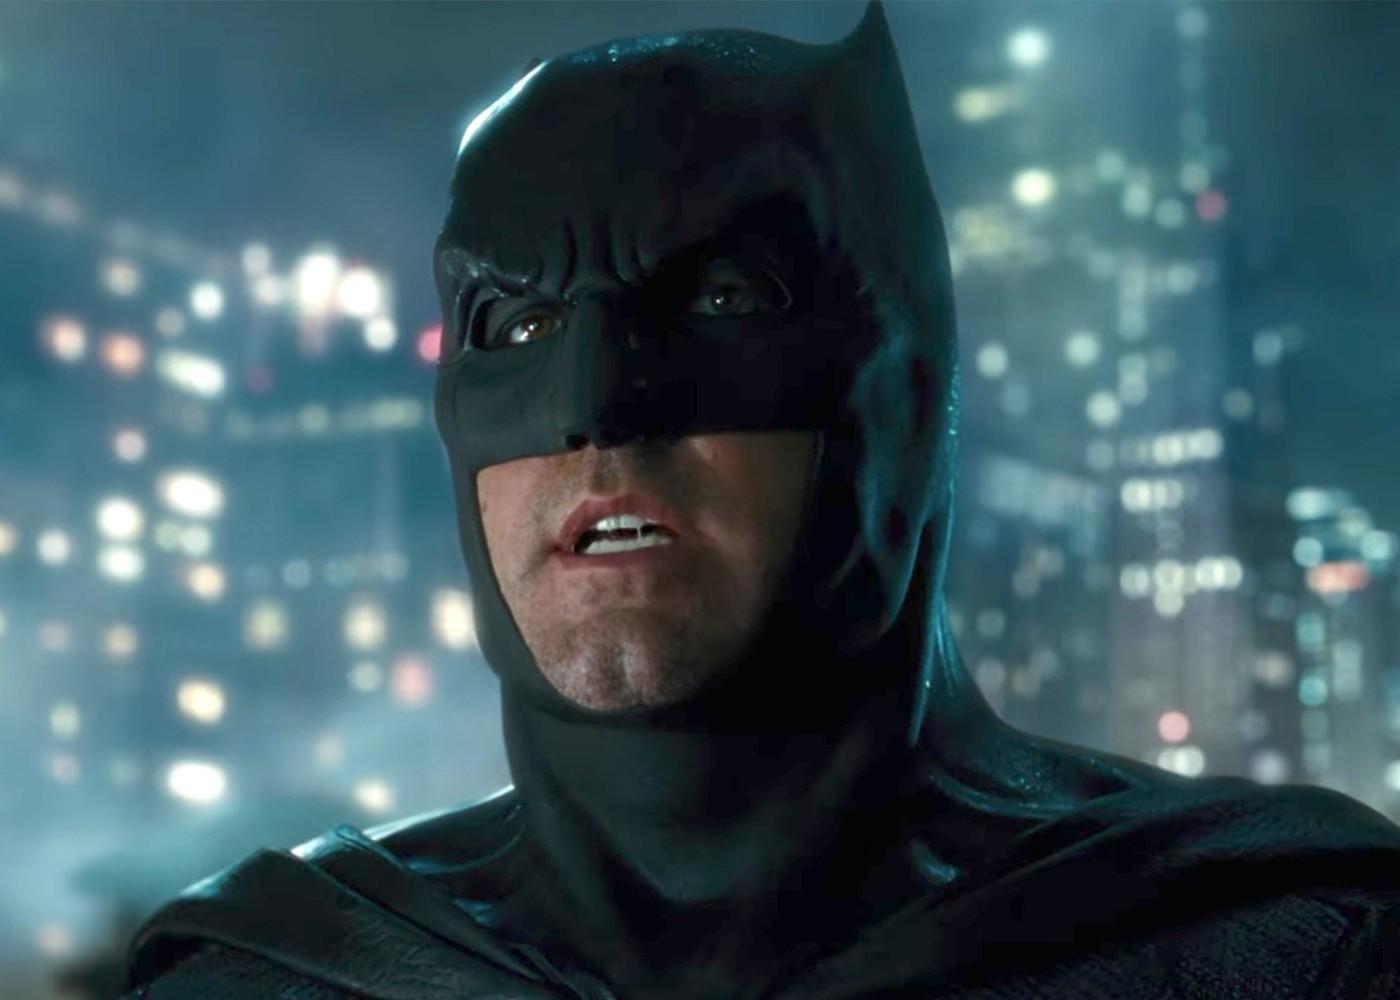 Matt Reeves Clarifies His Comment on The Batman's DCEU Connection